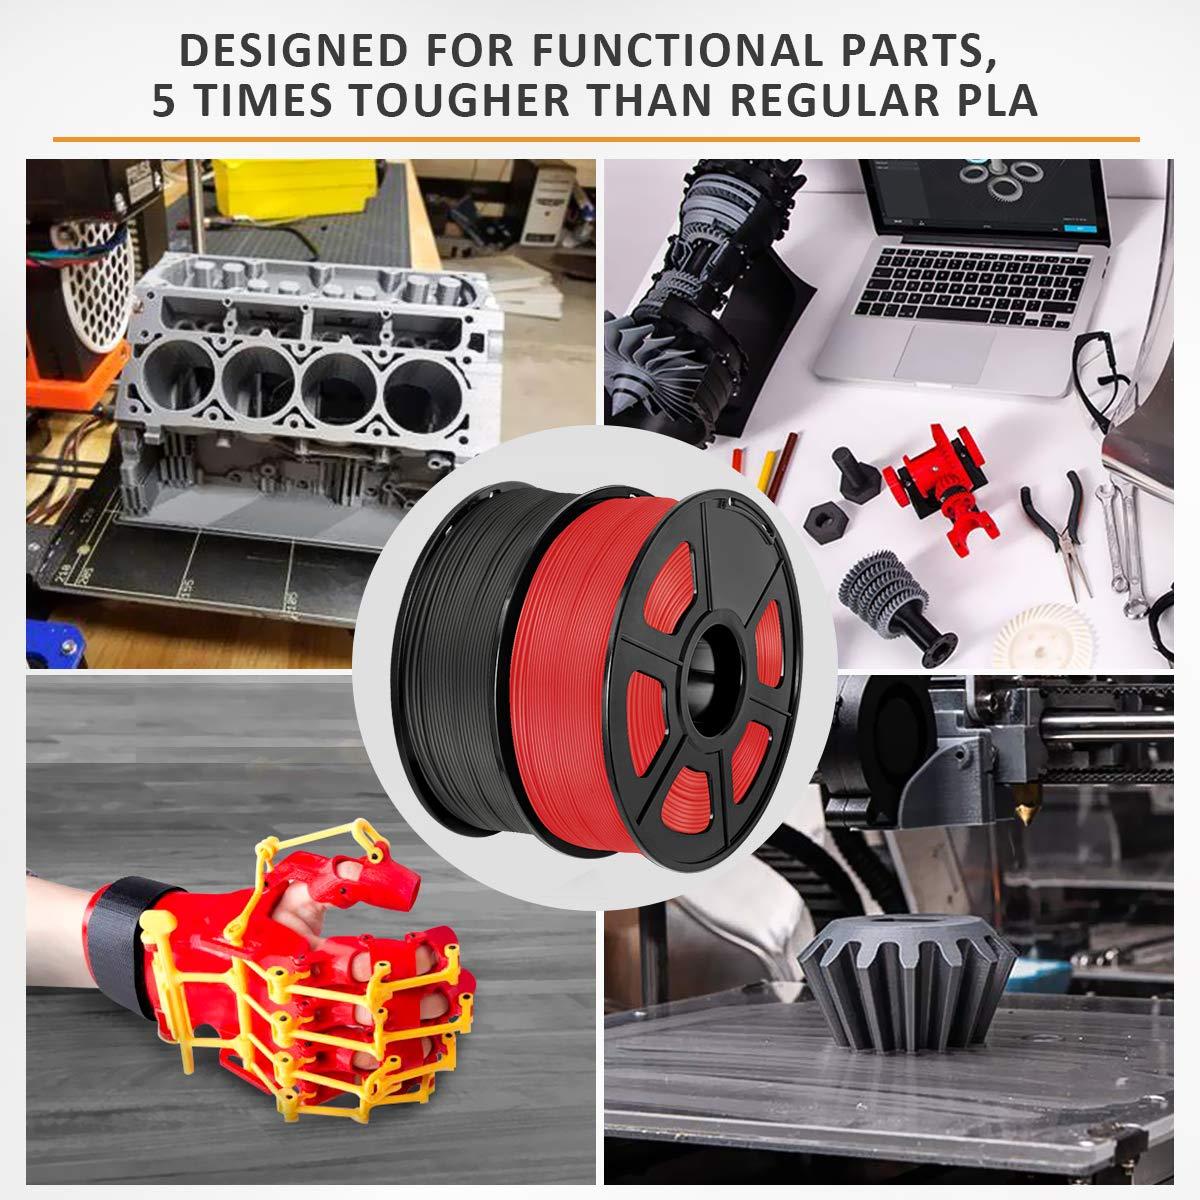 2 kg Spool SUNLU ABS 3D Printer Filament 1.75mm ABS Black+Gray ABS Filament 1.75mm Dimensional Accuracy +//- 0.02 mm